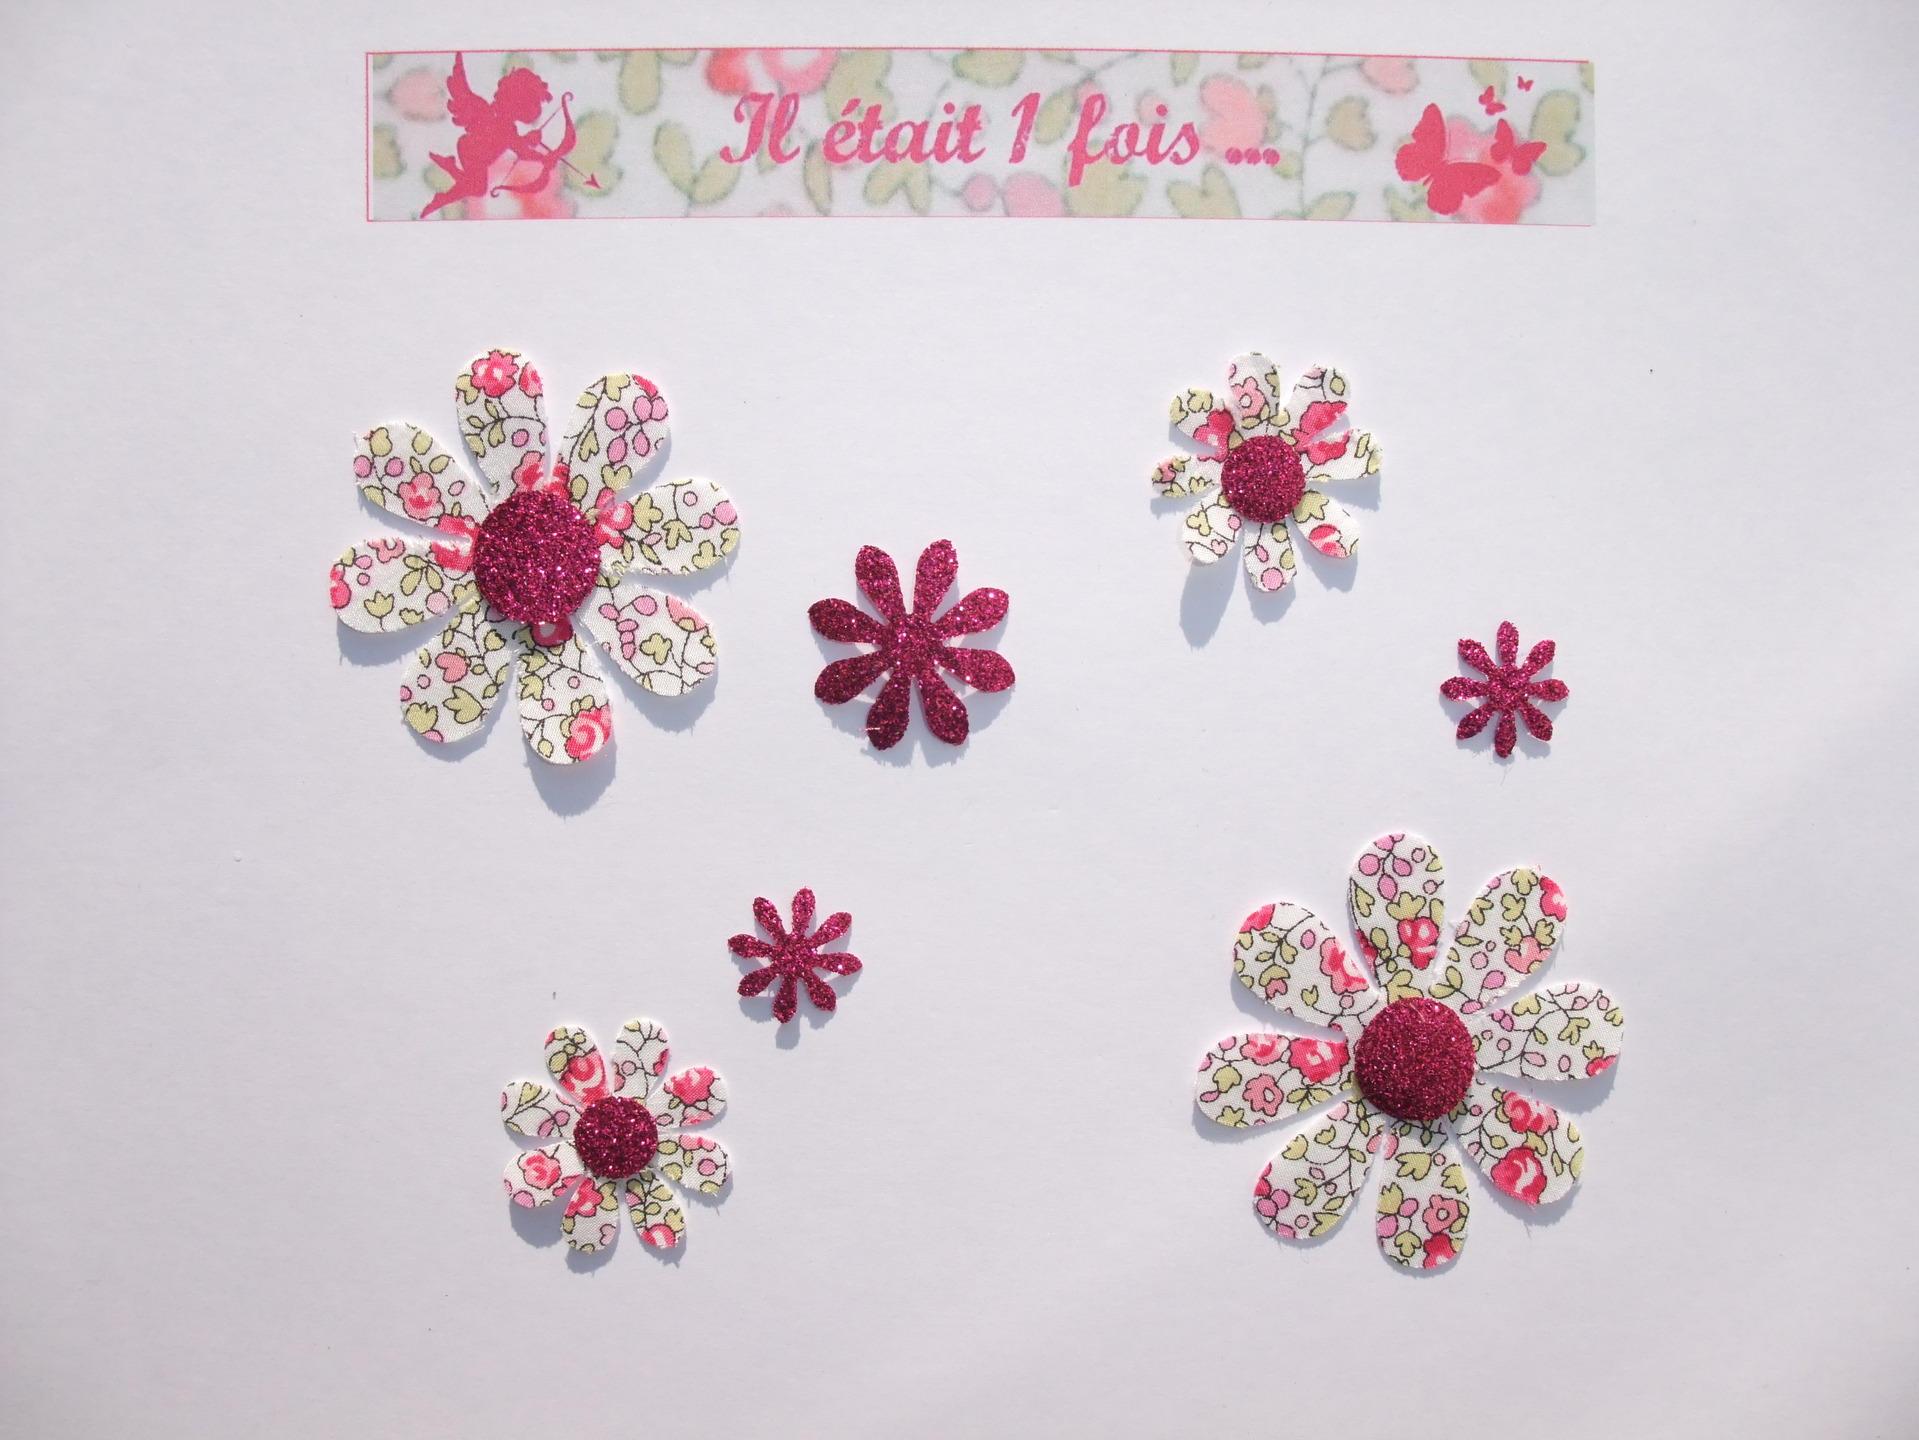 Applied 7 Seconds Flowers Liberty Eloise Pink Flex Glitter Patch